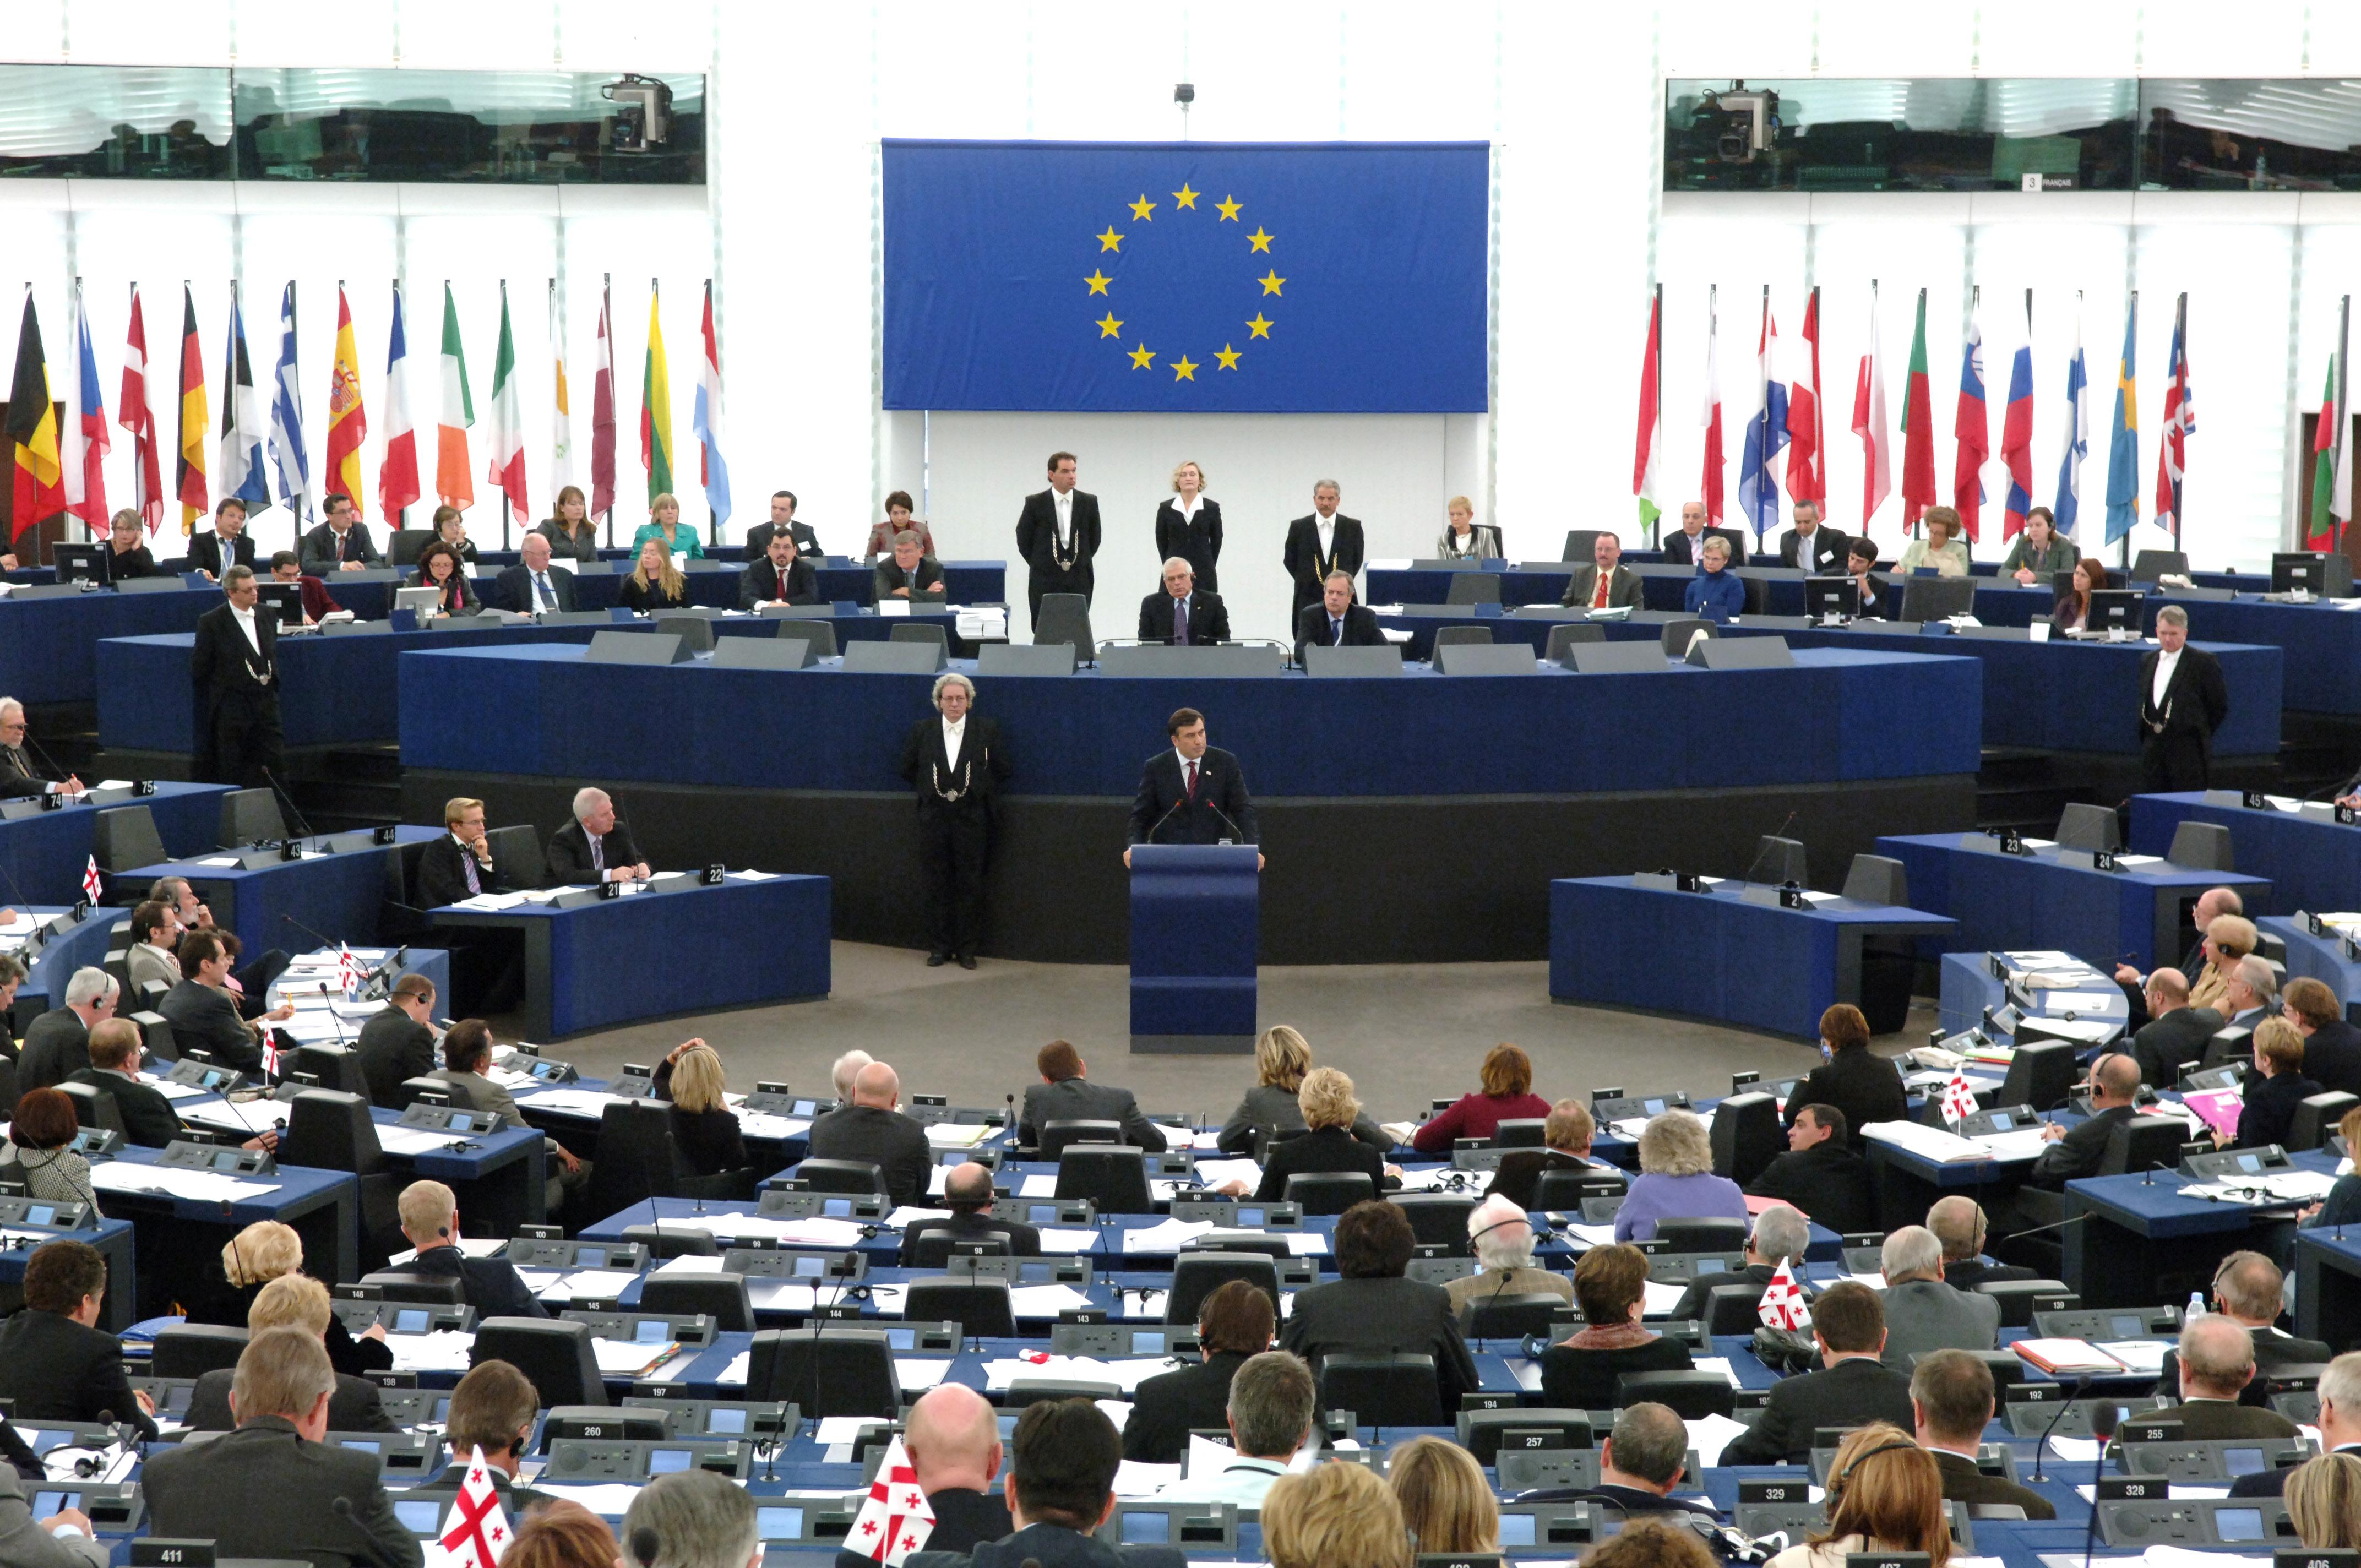 Article 13 approved: European Parliament sanctions controversial copyright legislation